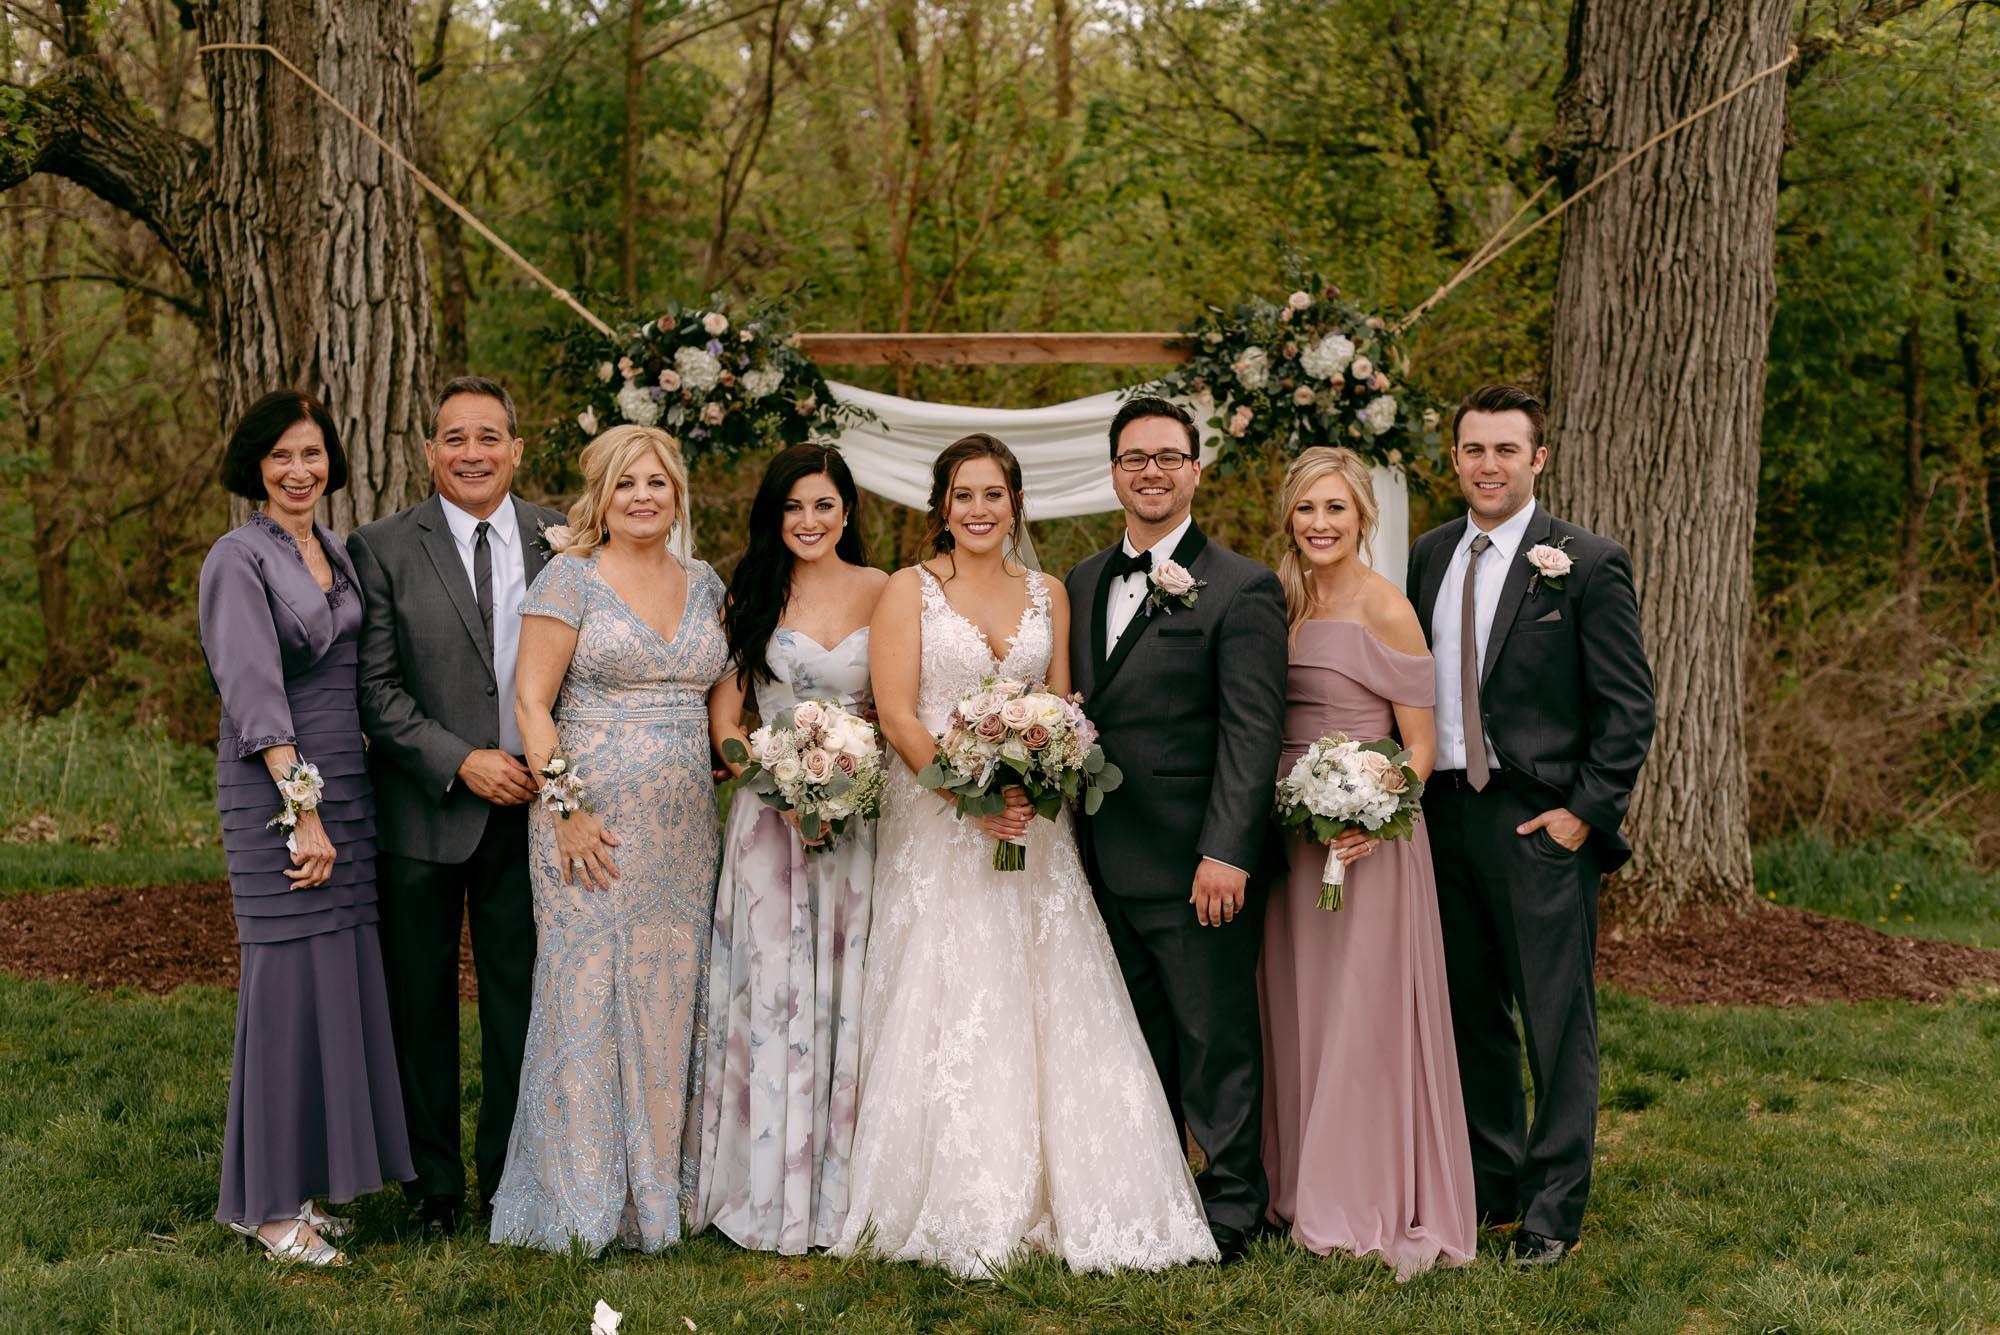 orchard-farms-pavillion-wedding-rockton-IL-wedding-photographers-311.jpg